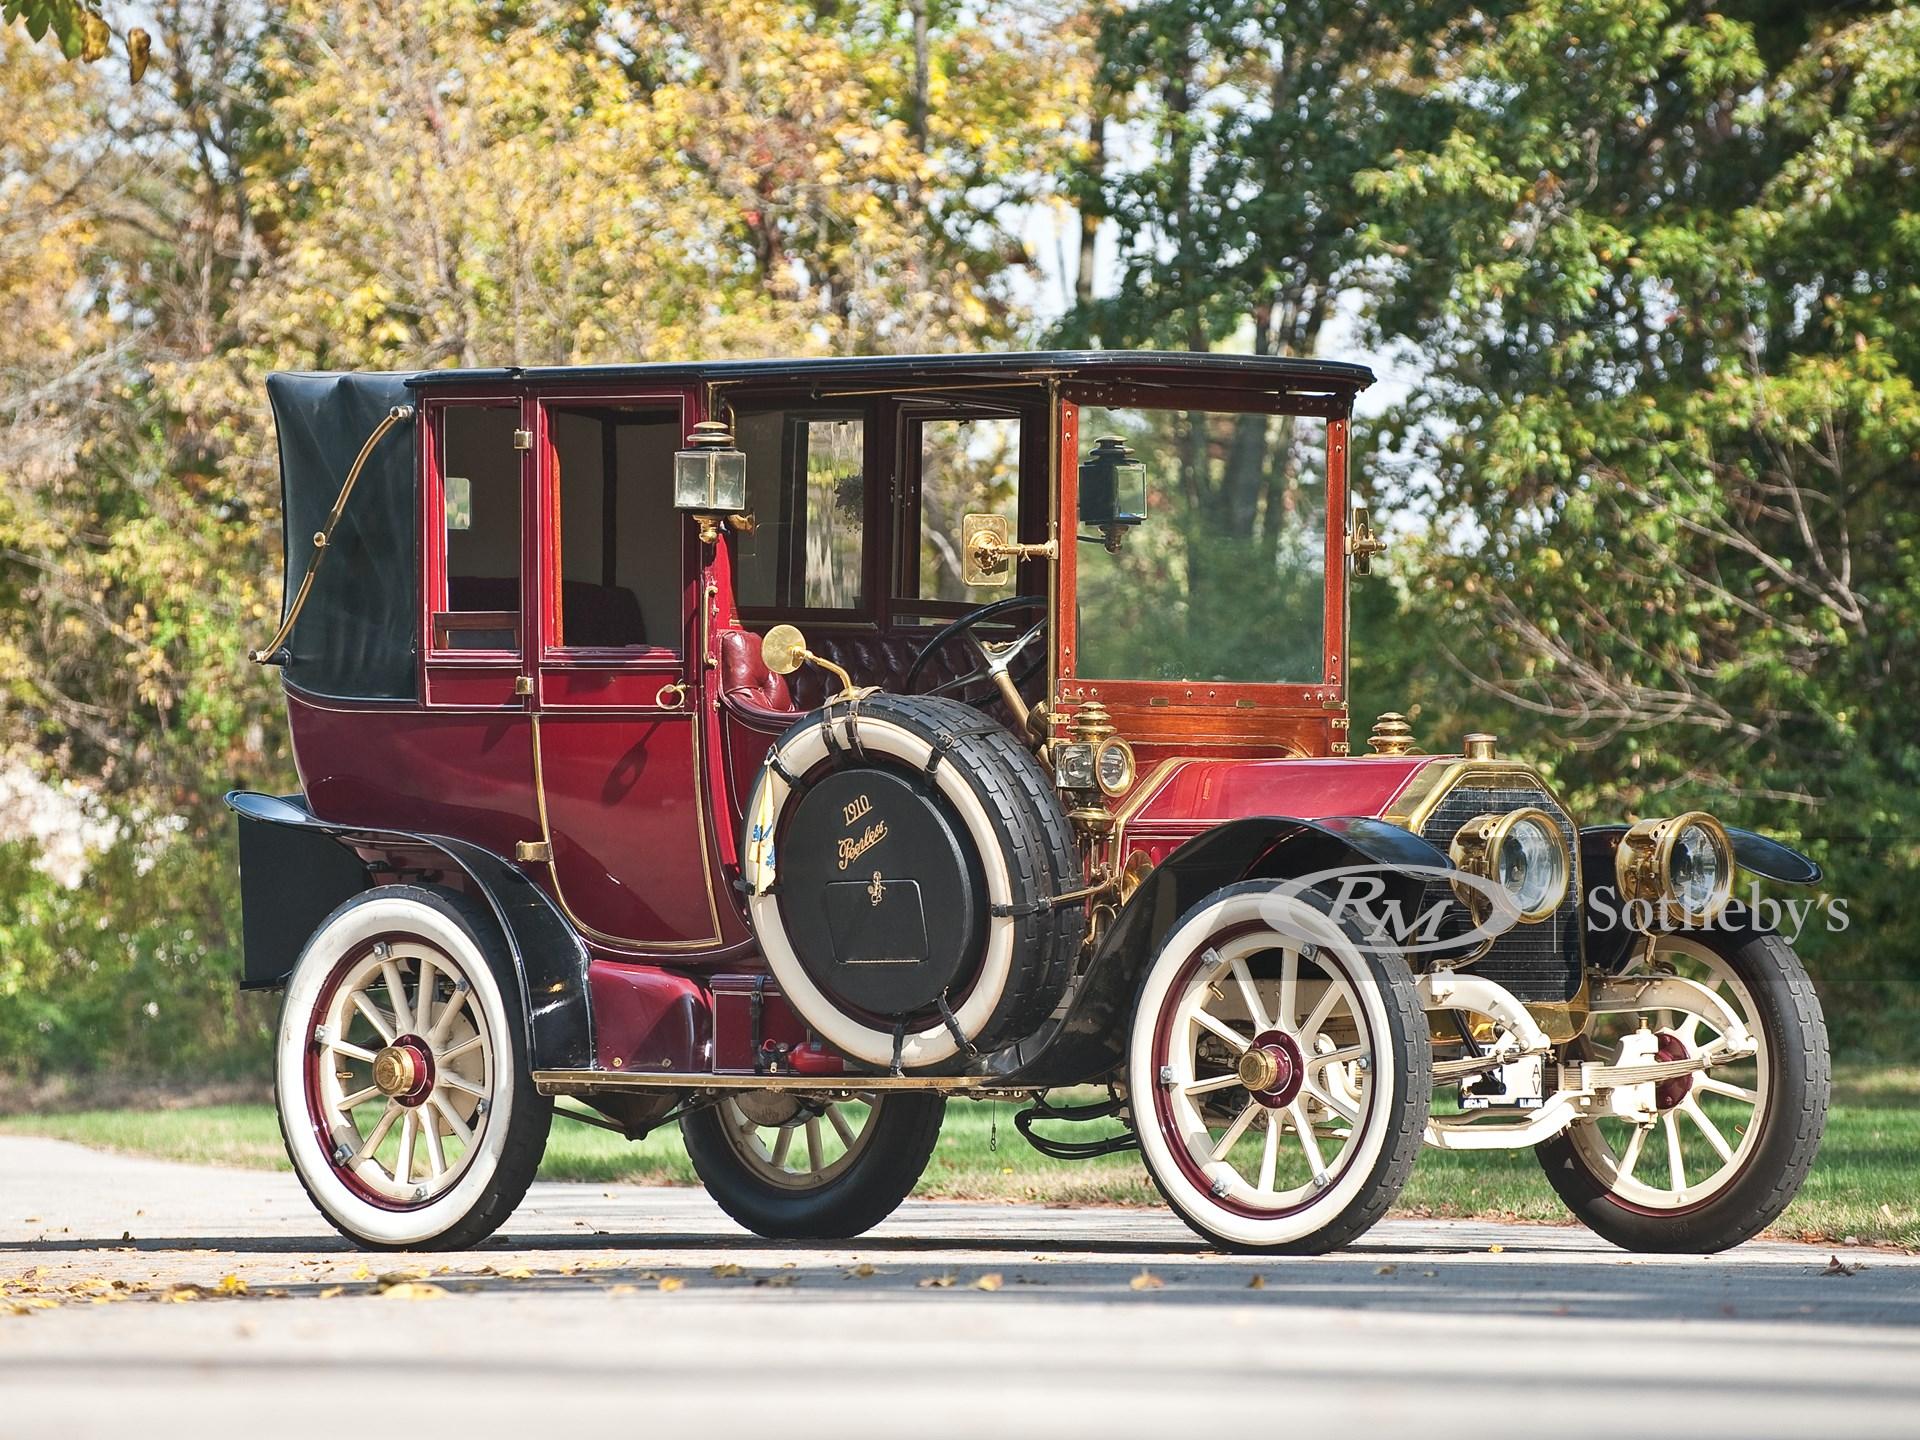 1910 Peerless 30 hp Open-Drive Landaulet by Brewster & Company